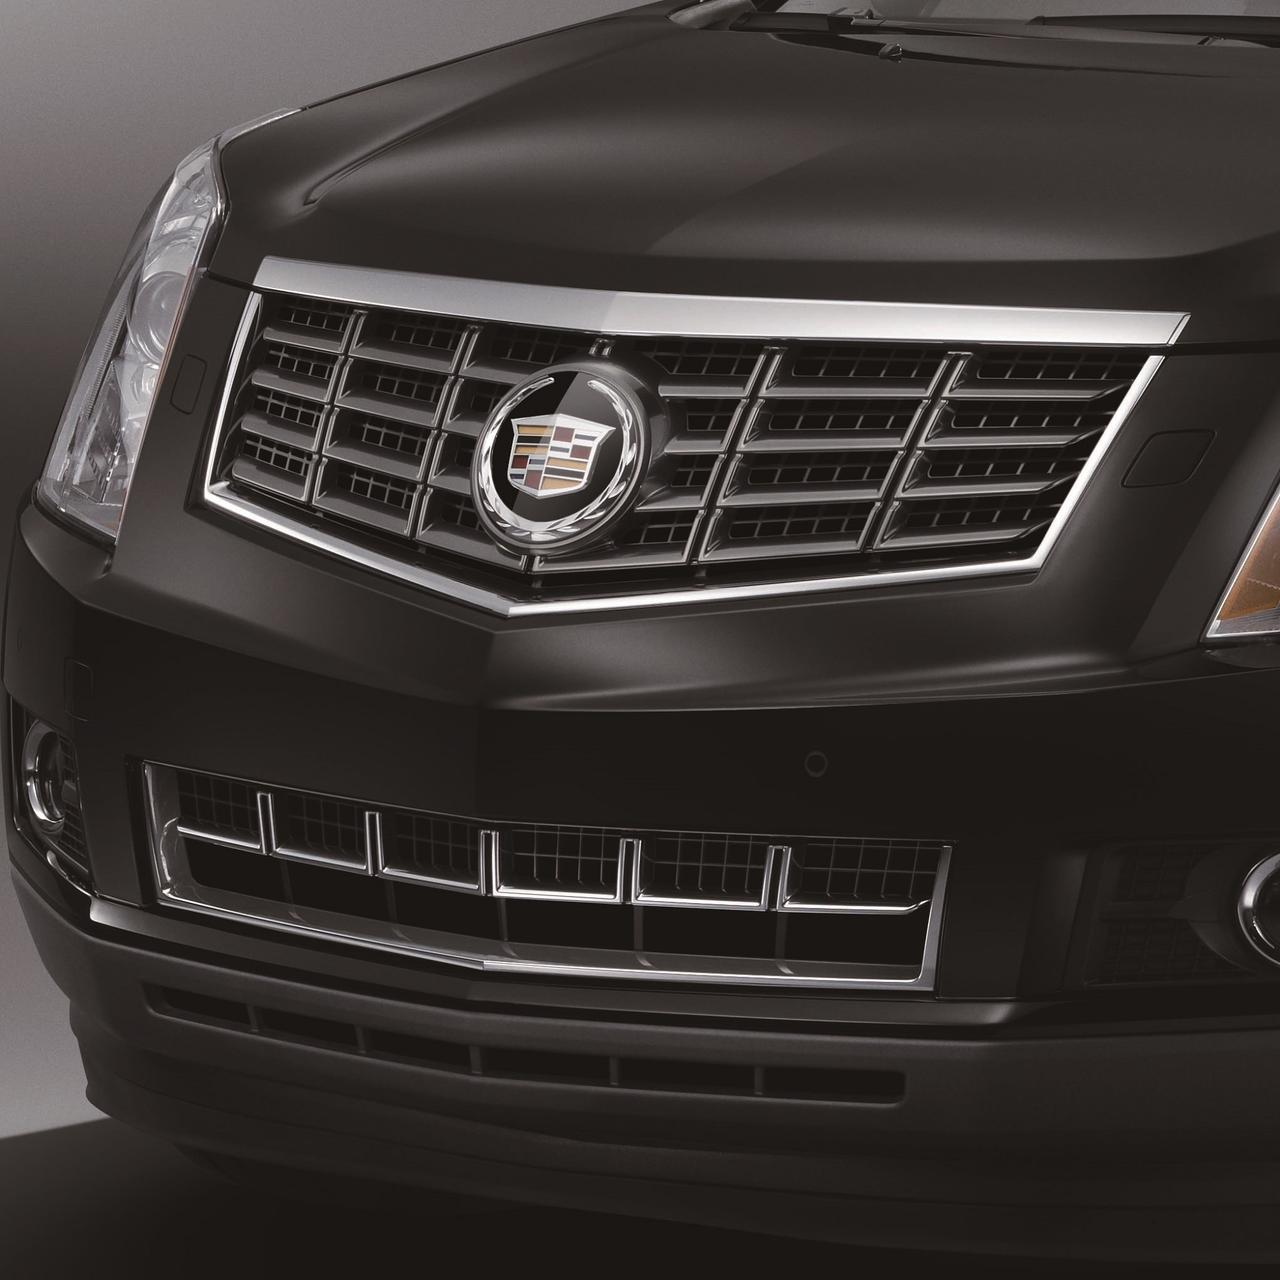 Cadillac Crossover Suv: 【CADILLAC SRX CROSSOVER Sport Edition】 ~インポートSUV&クロスオーバー